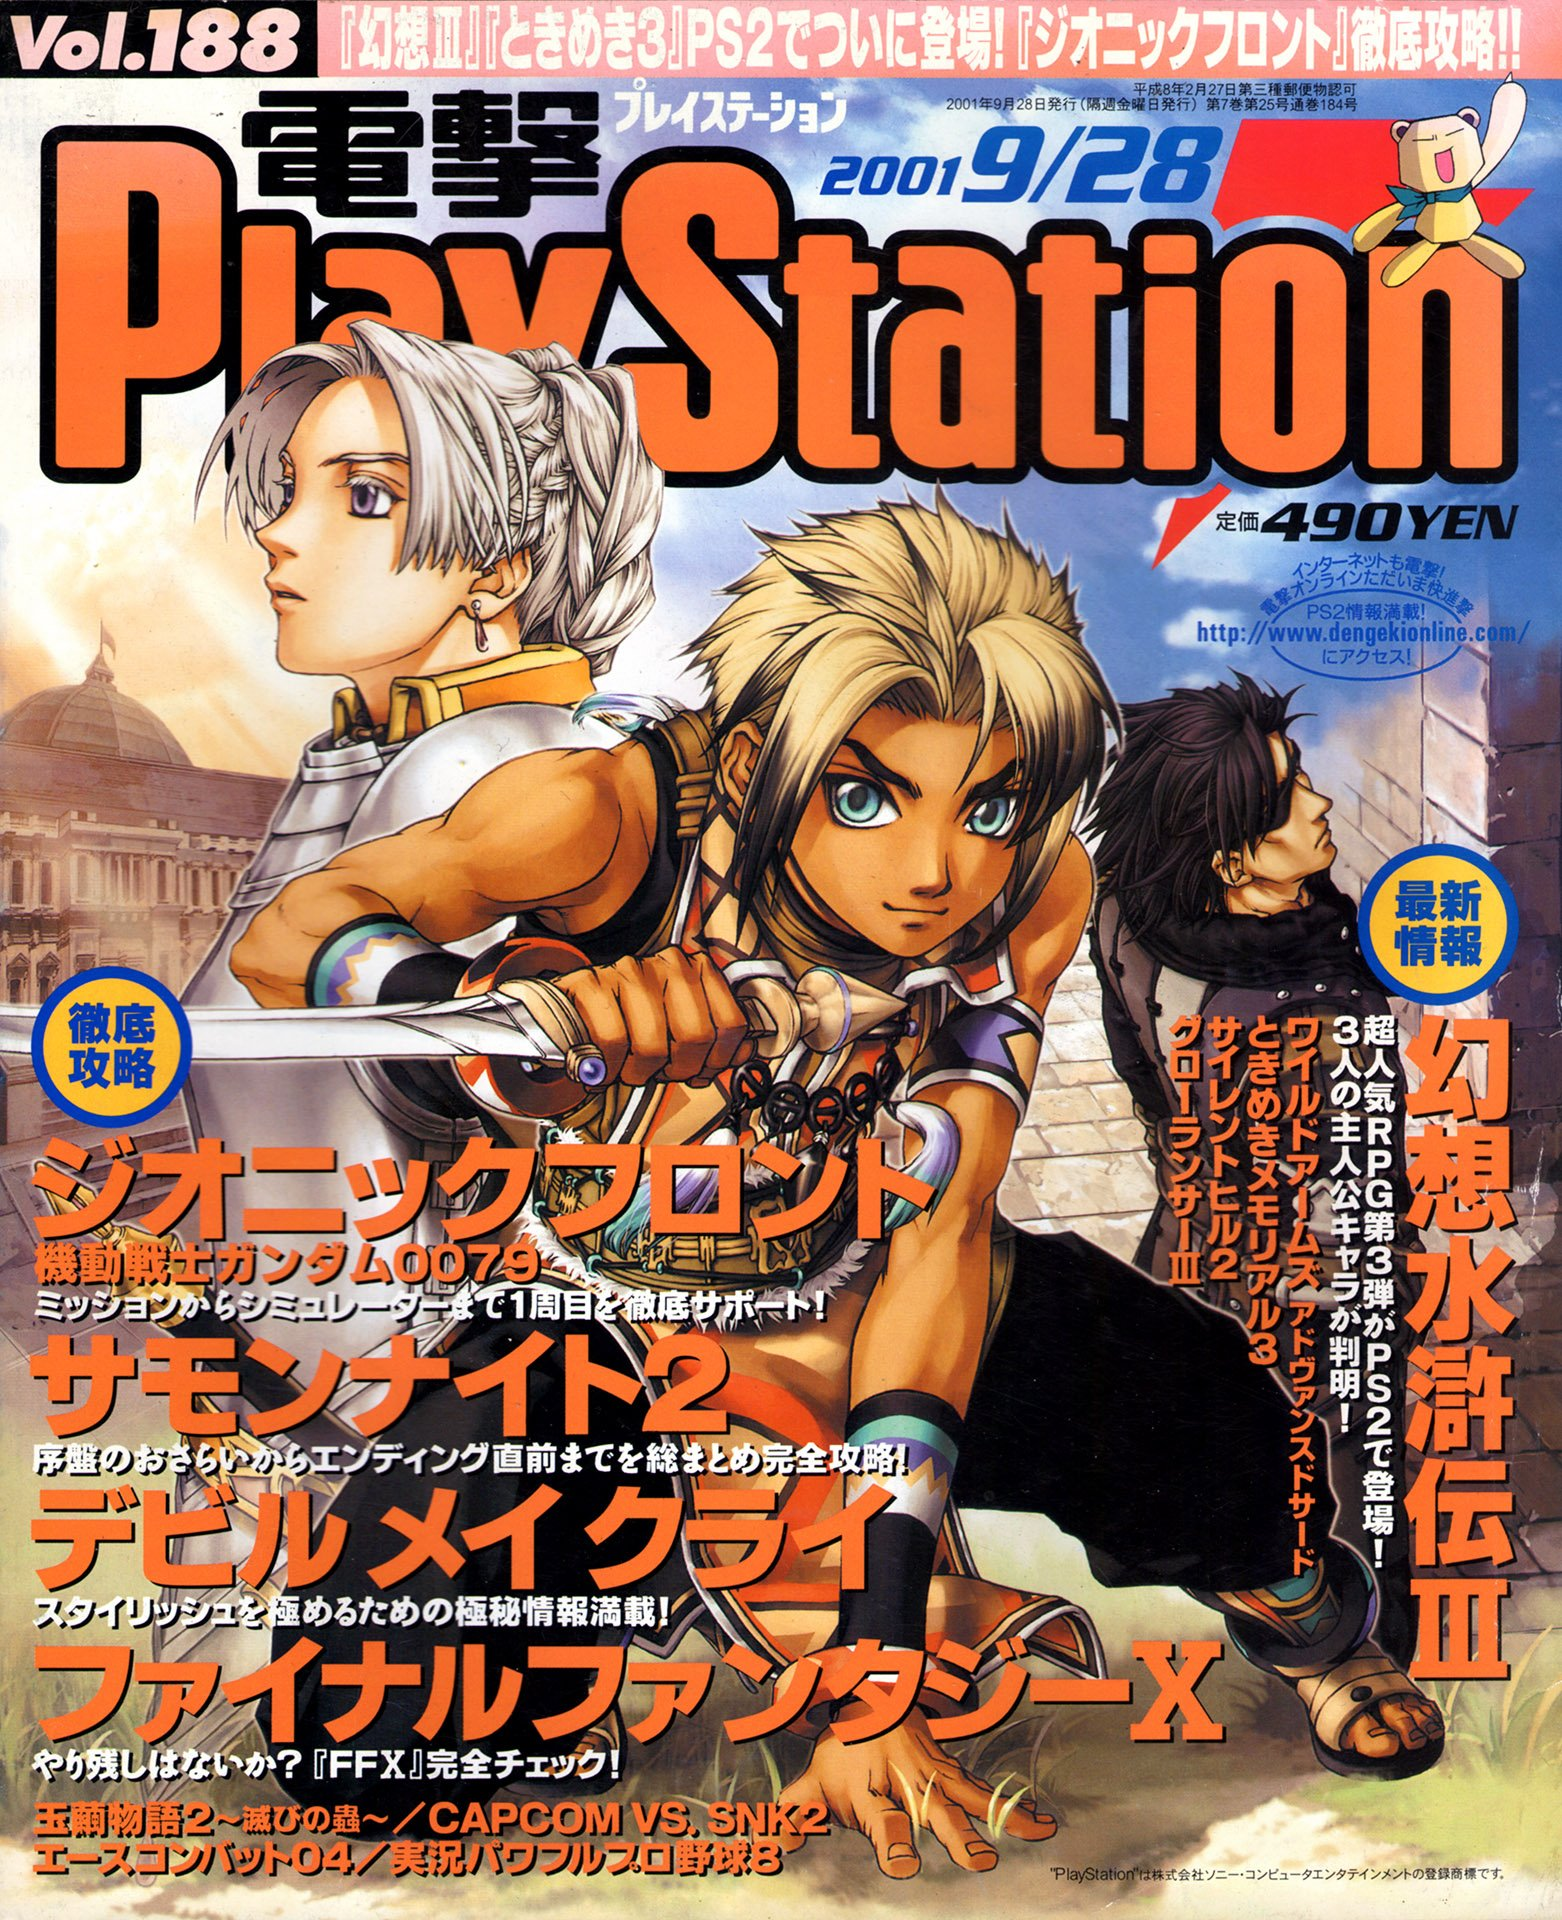 Dengeki PlayStation 188 (September 28, 2001)